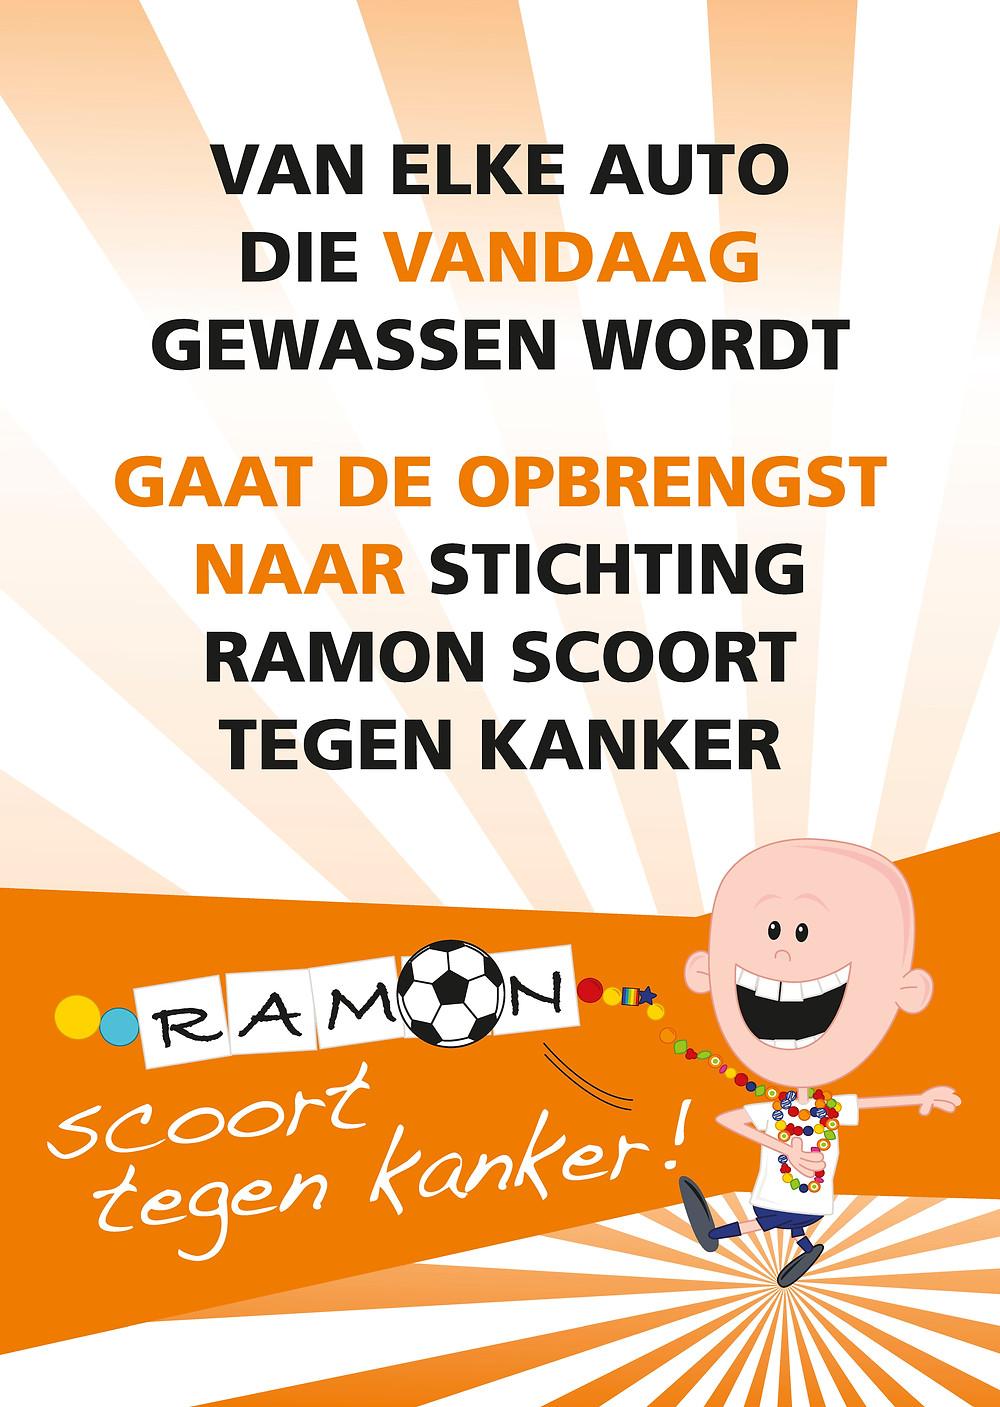 Stichting Ramon scoort tegen kanker - poster.jpg